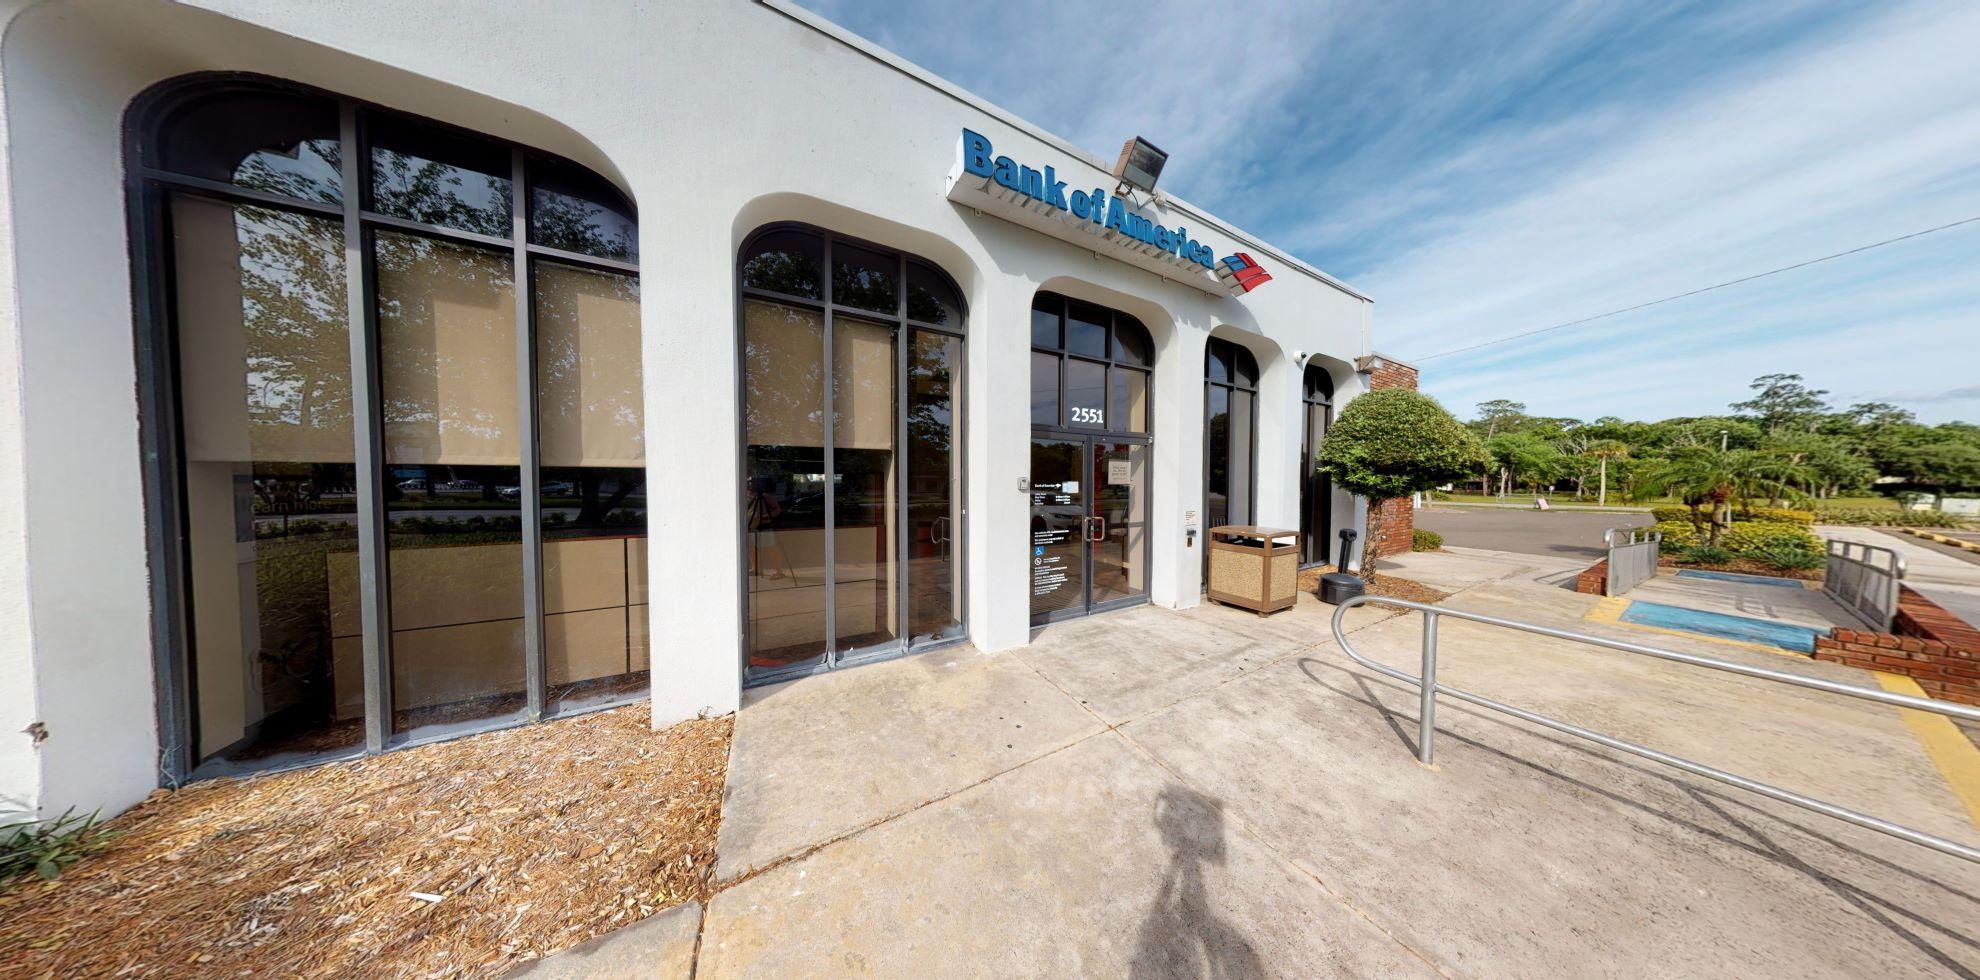 Bank of America financial center with drive-thru ATM | 2551 Tarpon Woods Blvd, Palm Harbor, FL 34685